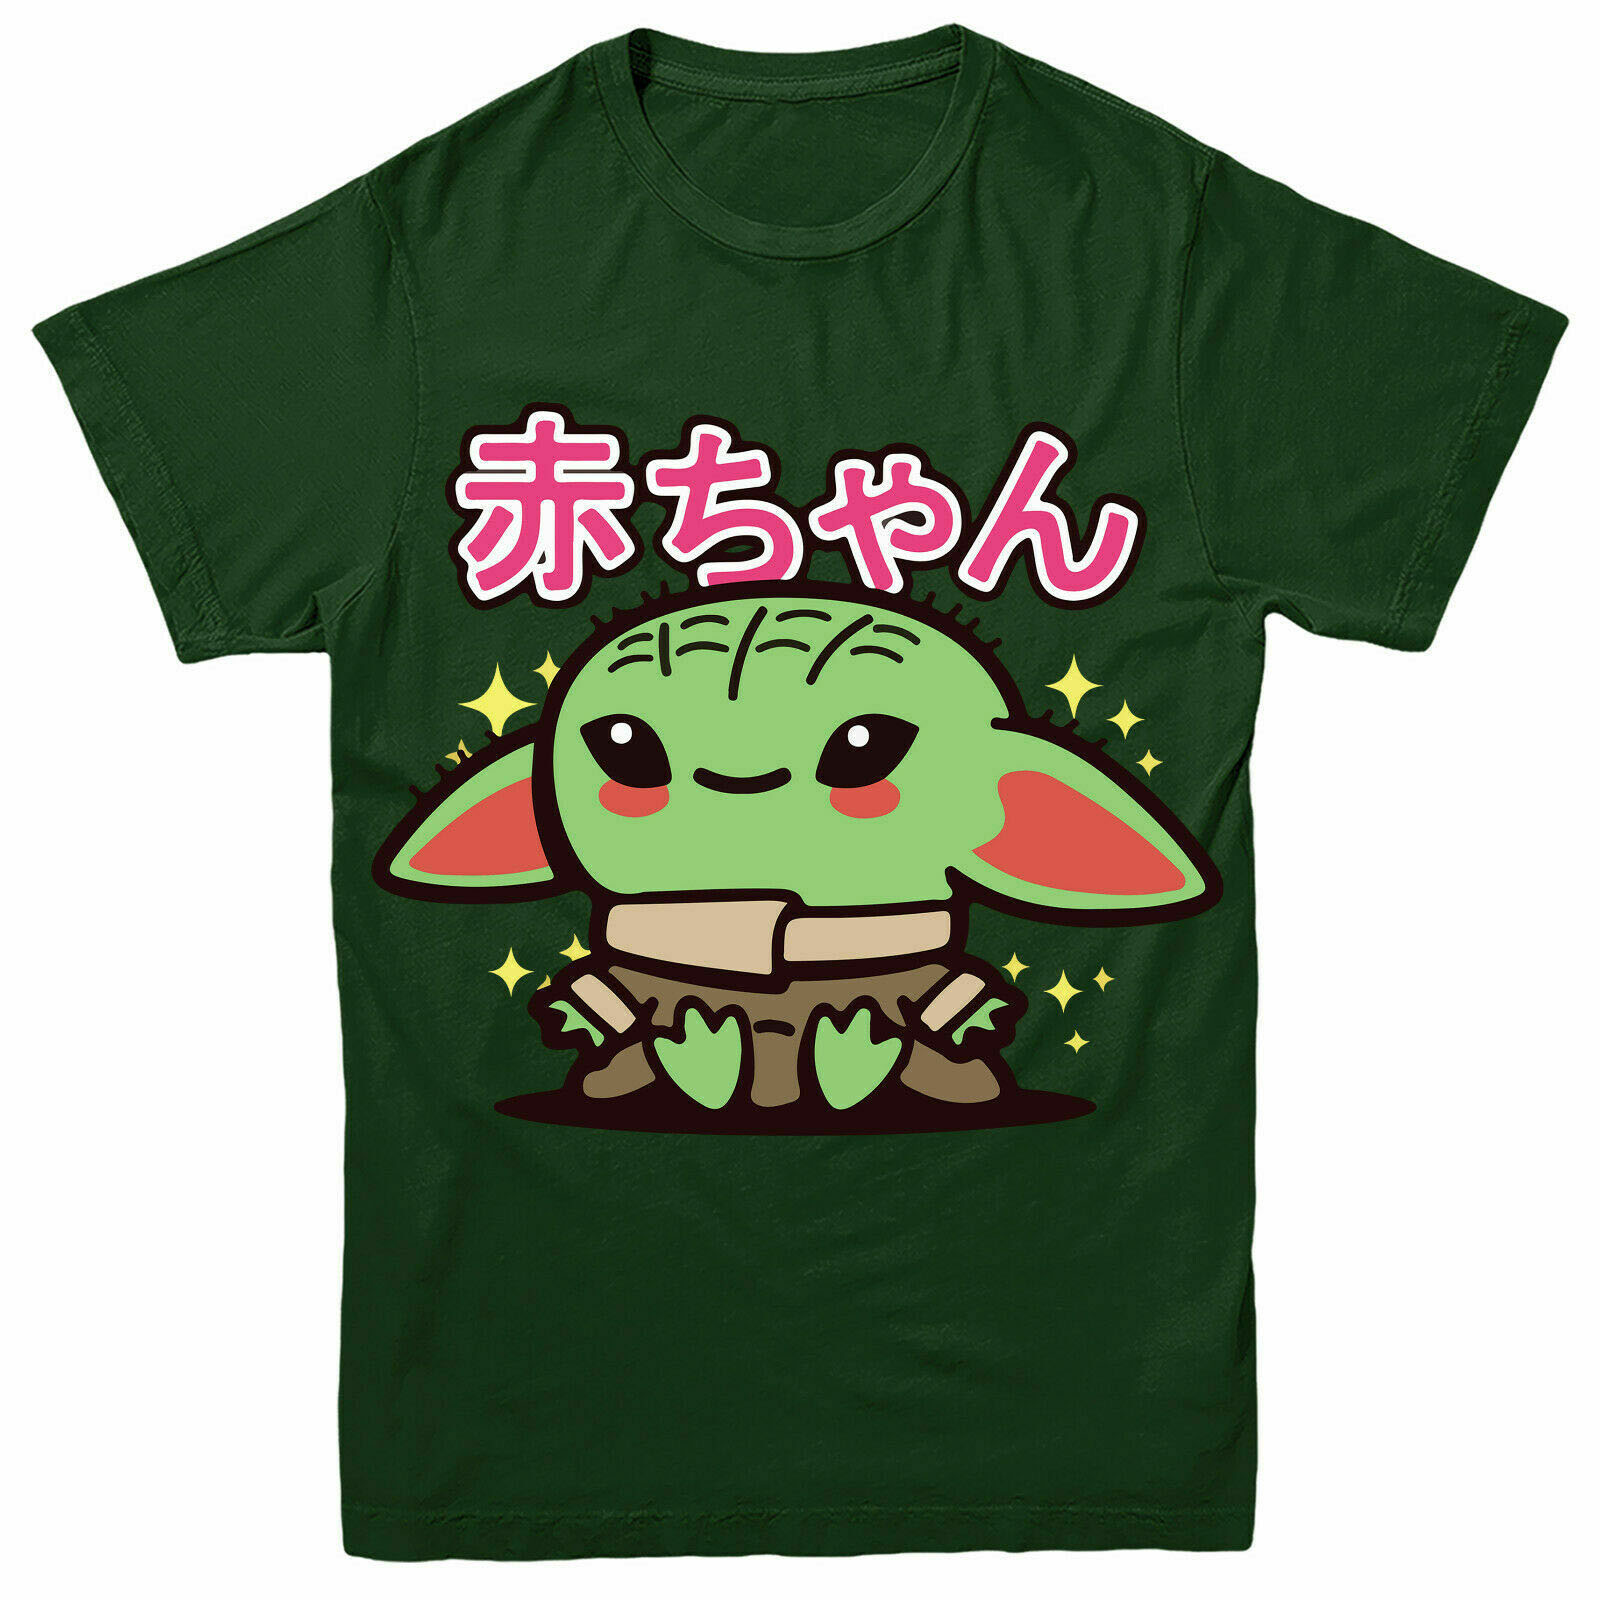 Camiseta navideña Kawaii para bebés, para hombres y mujeres de Yoda mandaloriano, regalo festivo, camiseta 20 ° 30 ° 40 ° aniversario